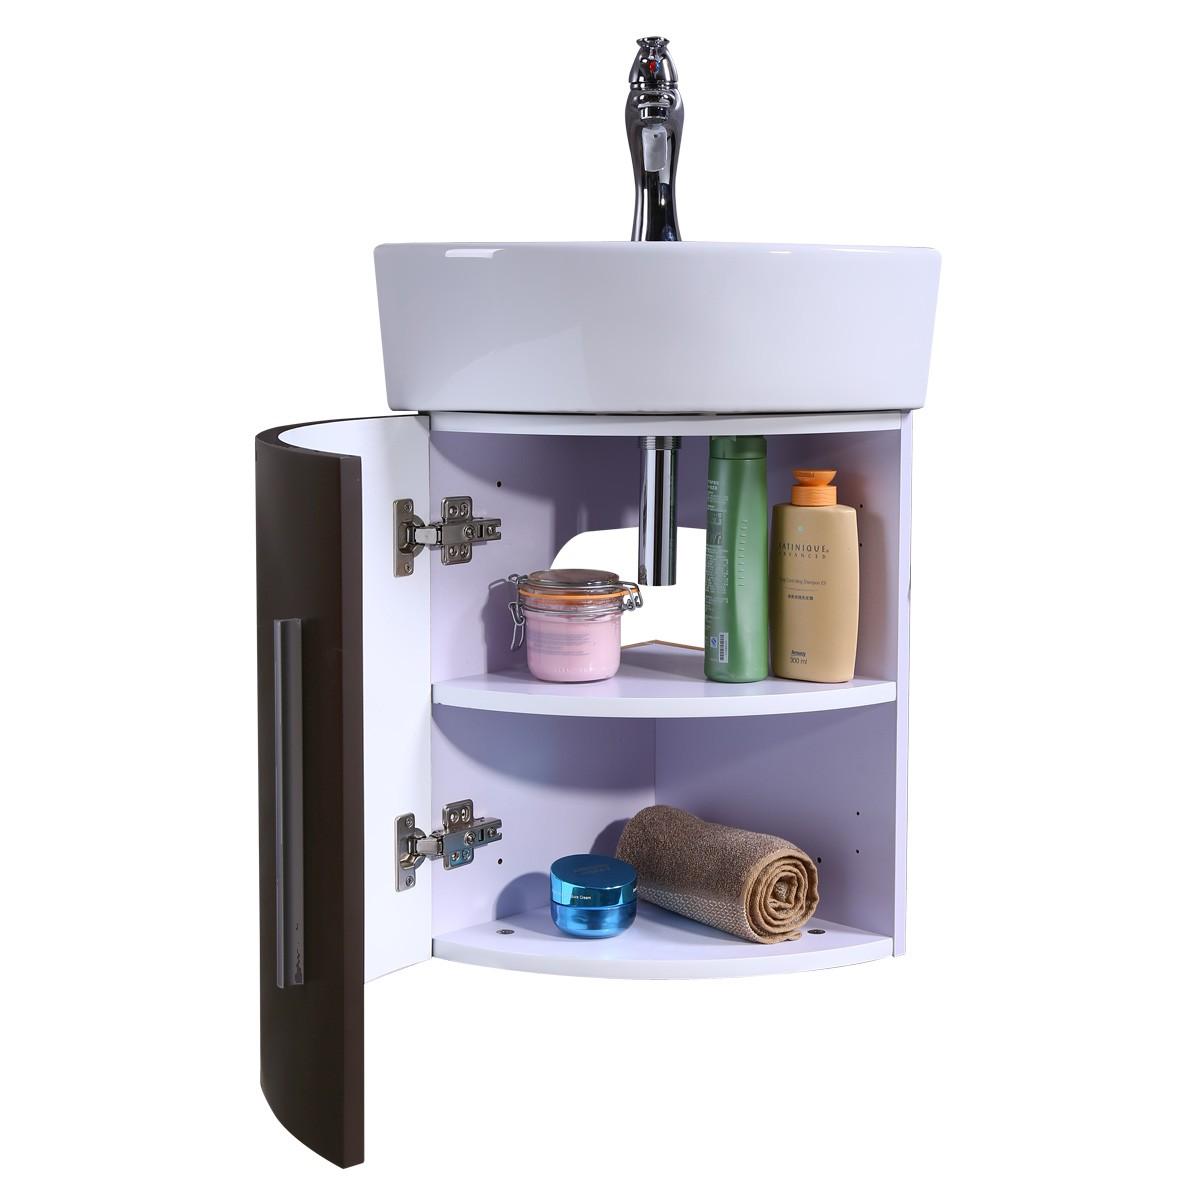 Renovators Supply Corner Bathroom White and Brown Vanity Cabinet Sink Bathroom Cabinet Sink Vanity Sinks For Bathrooms Wall Mount Cabinet Sink